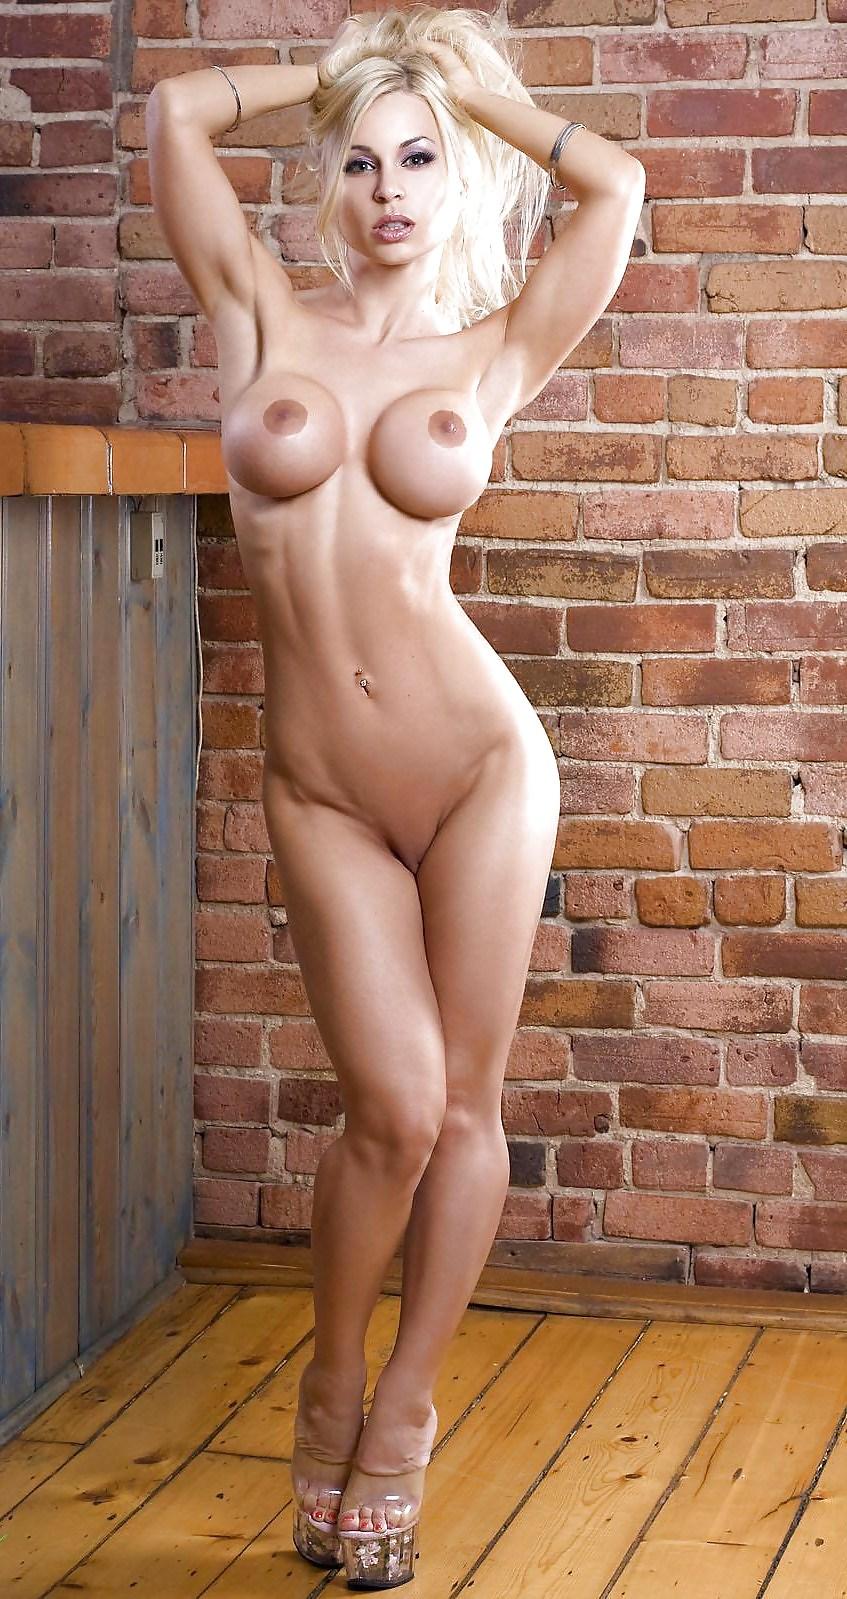 Big boobs on a tight body